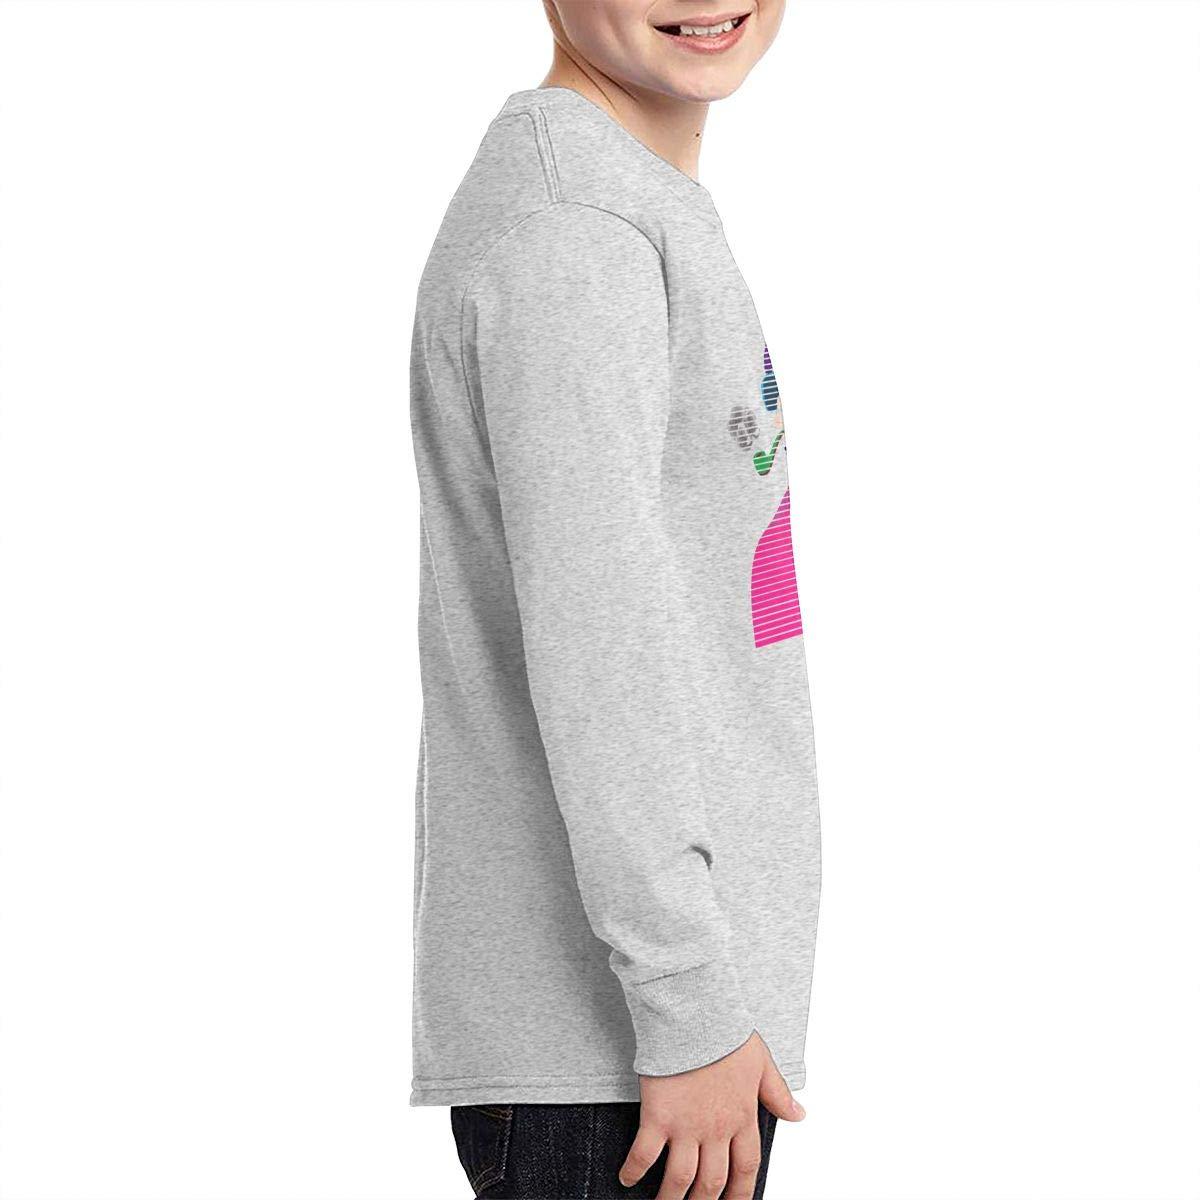 Lenny Kravitz Boys Fashion Classic Long Sleeve T-Shirt Boy Long Sleeve Cotton Round Neck T-Shirt